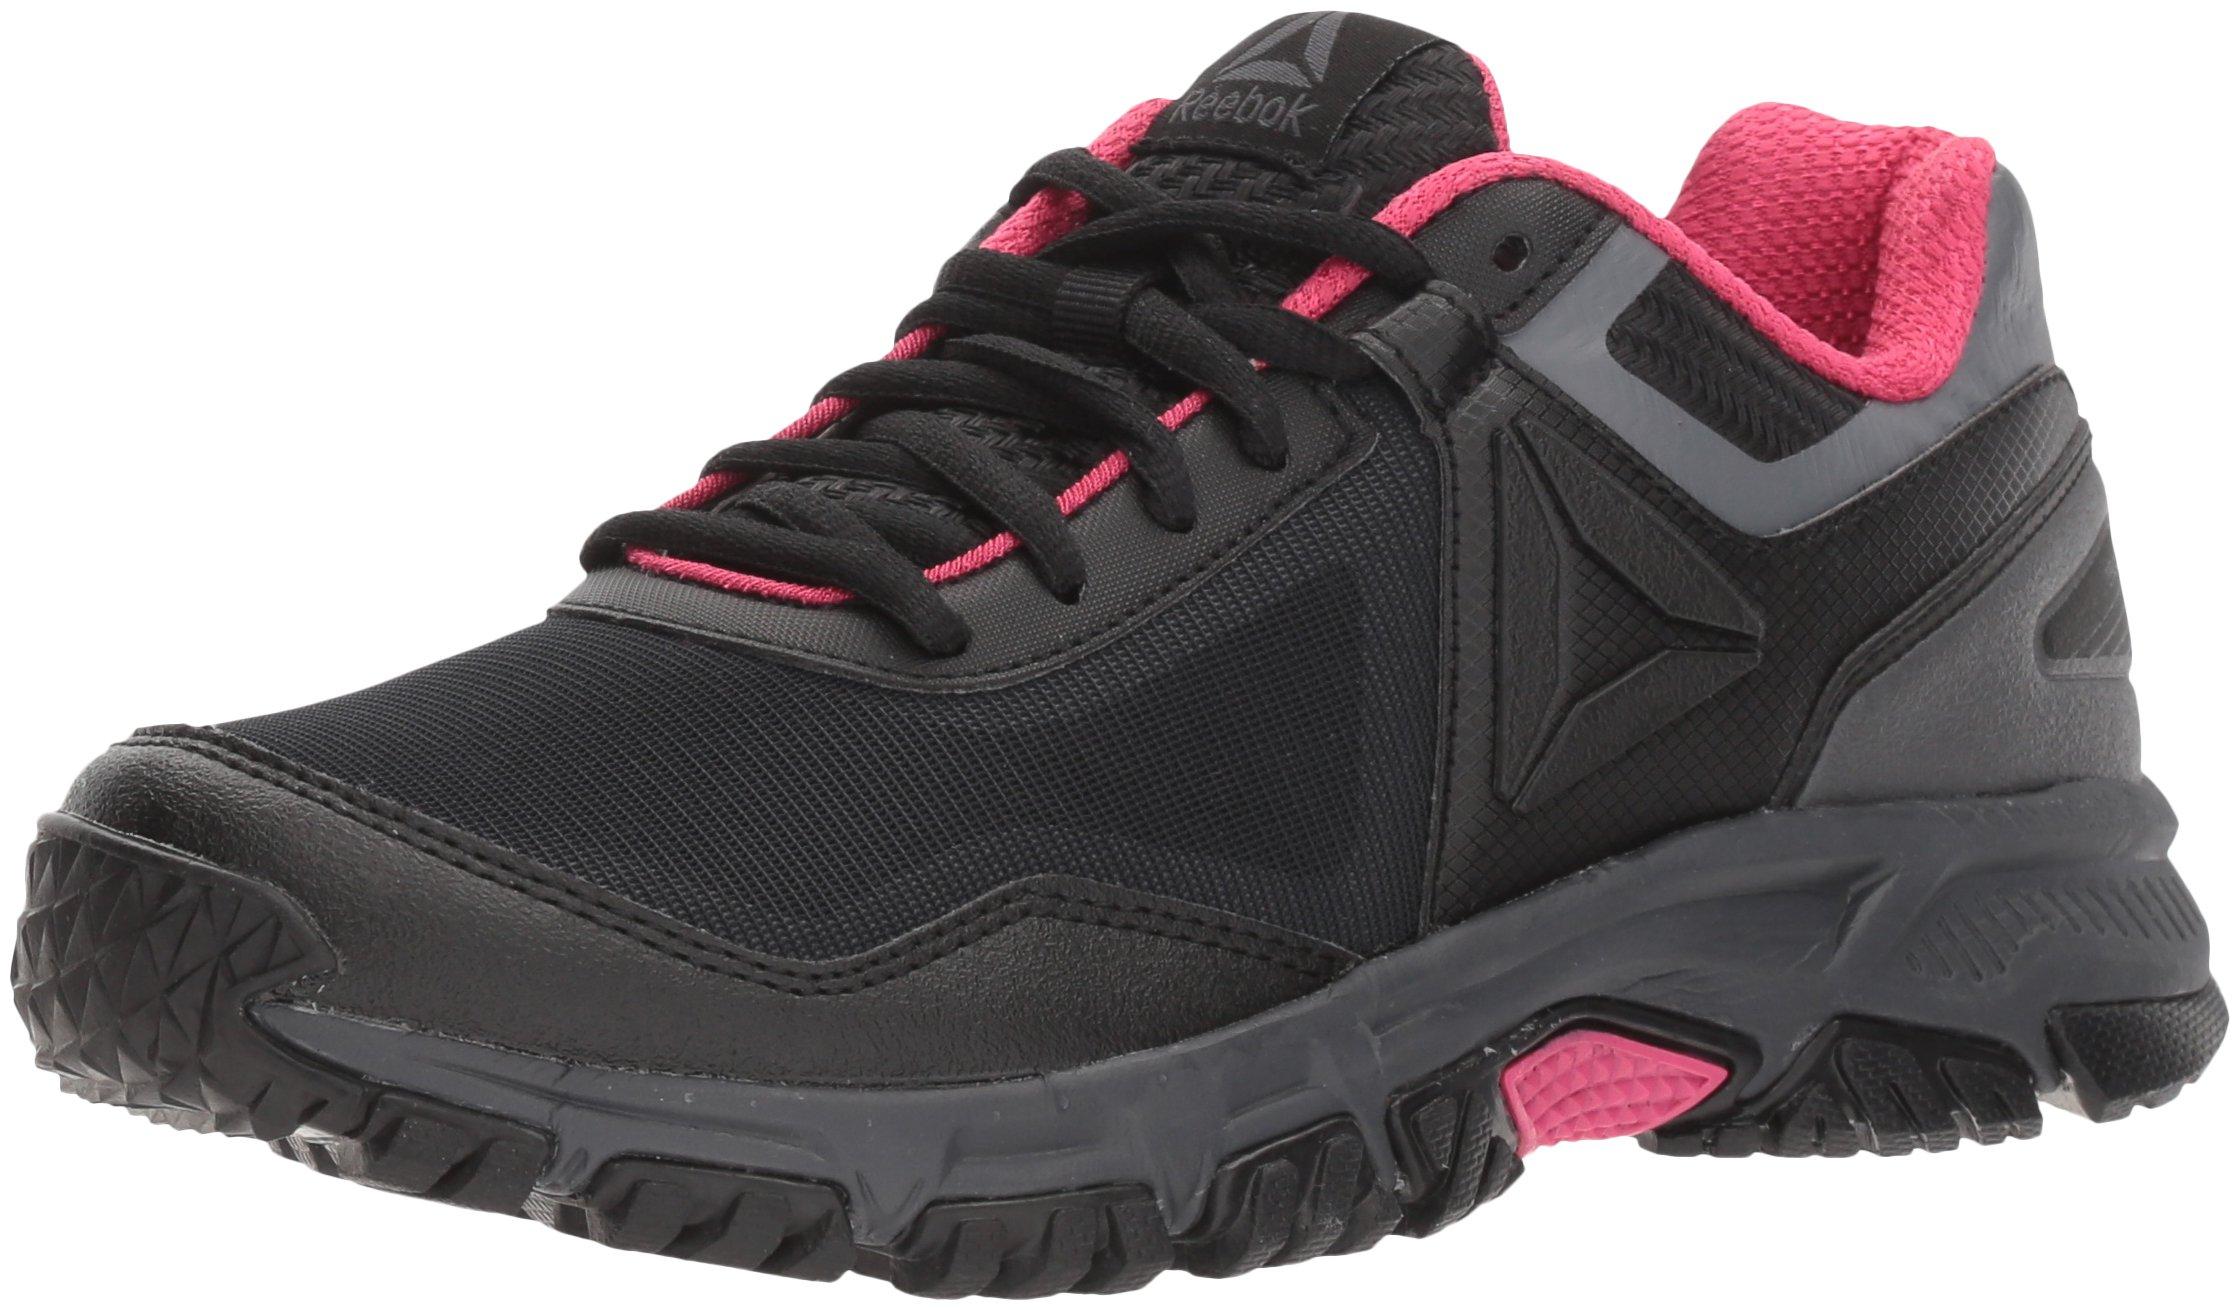 Reebok Women's Ridgerider Trail 3.0 Sneaker, Black/Ash Grey/Acid Pink, 8 M US